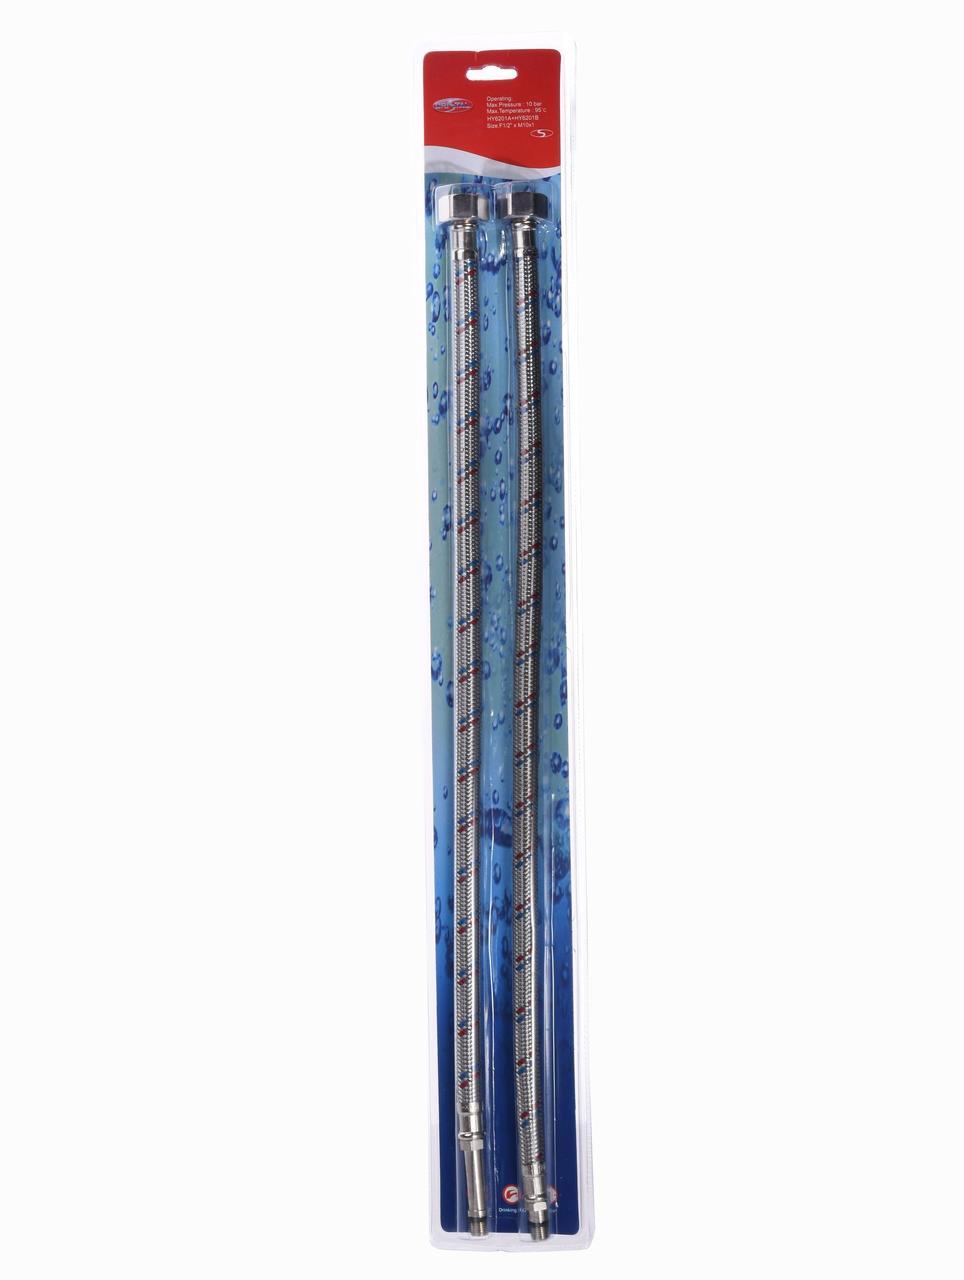 "Шланг для смесителя Solomon (нерж.) М10х1/2"" 1,0м (HY6201 A+B)  ПАРА в блистере"